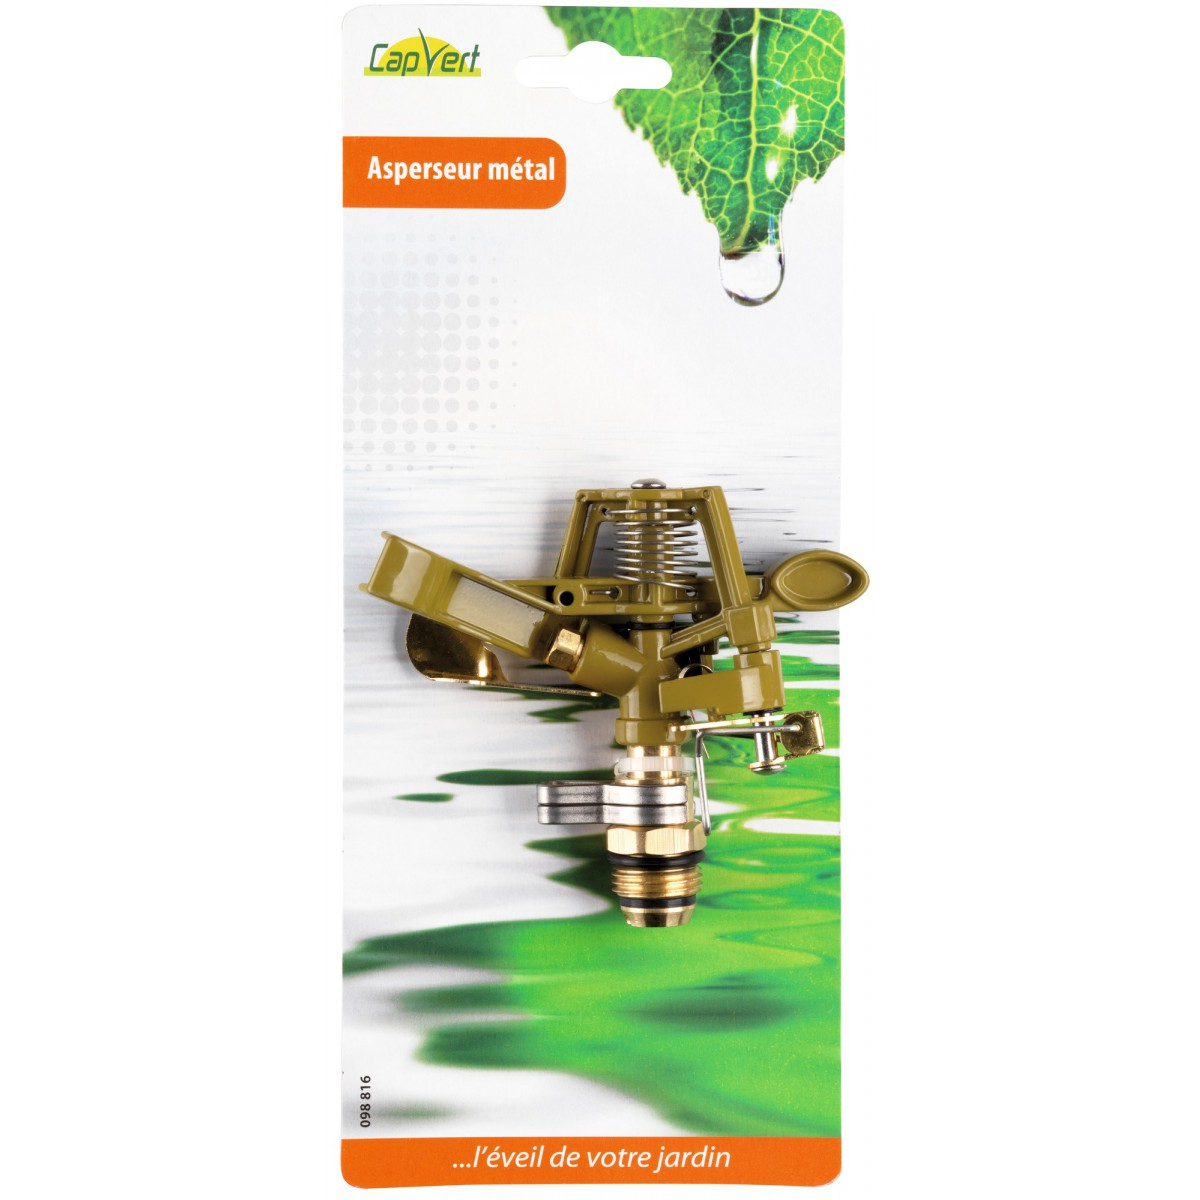 Asperseur métal Cap Vert - Filetage Mâle 15 x 21 mm